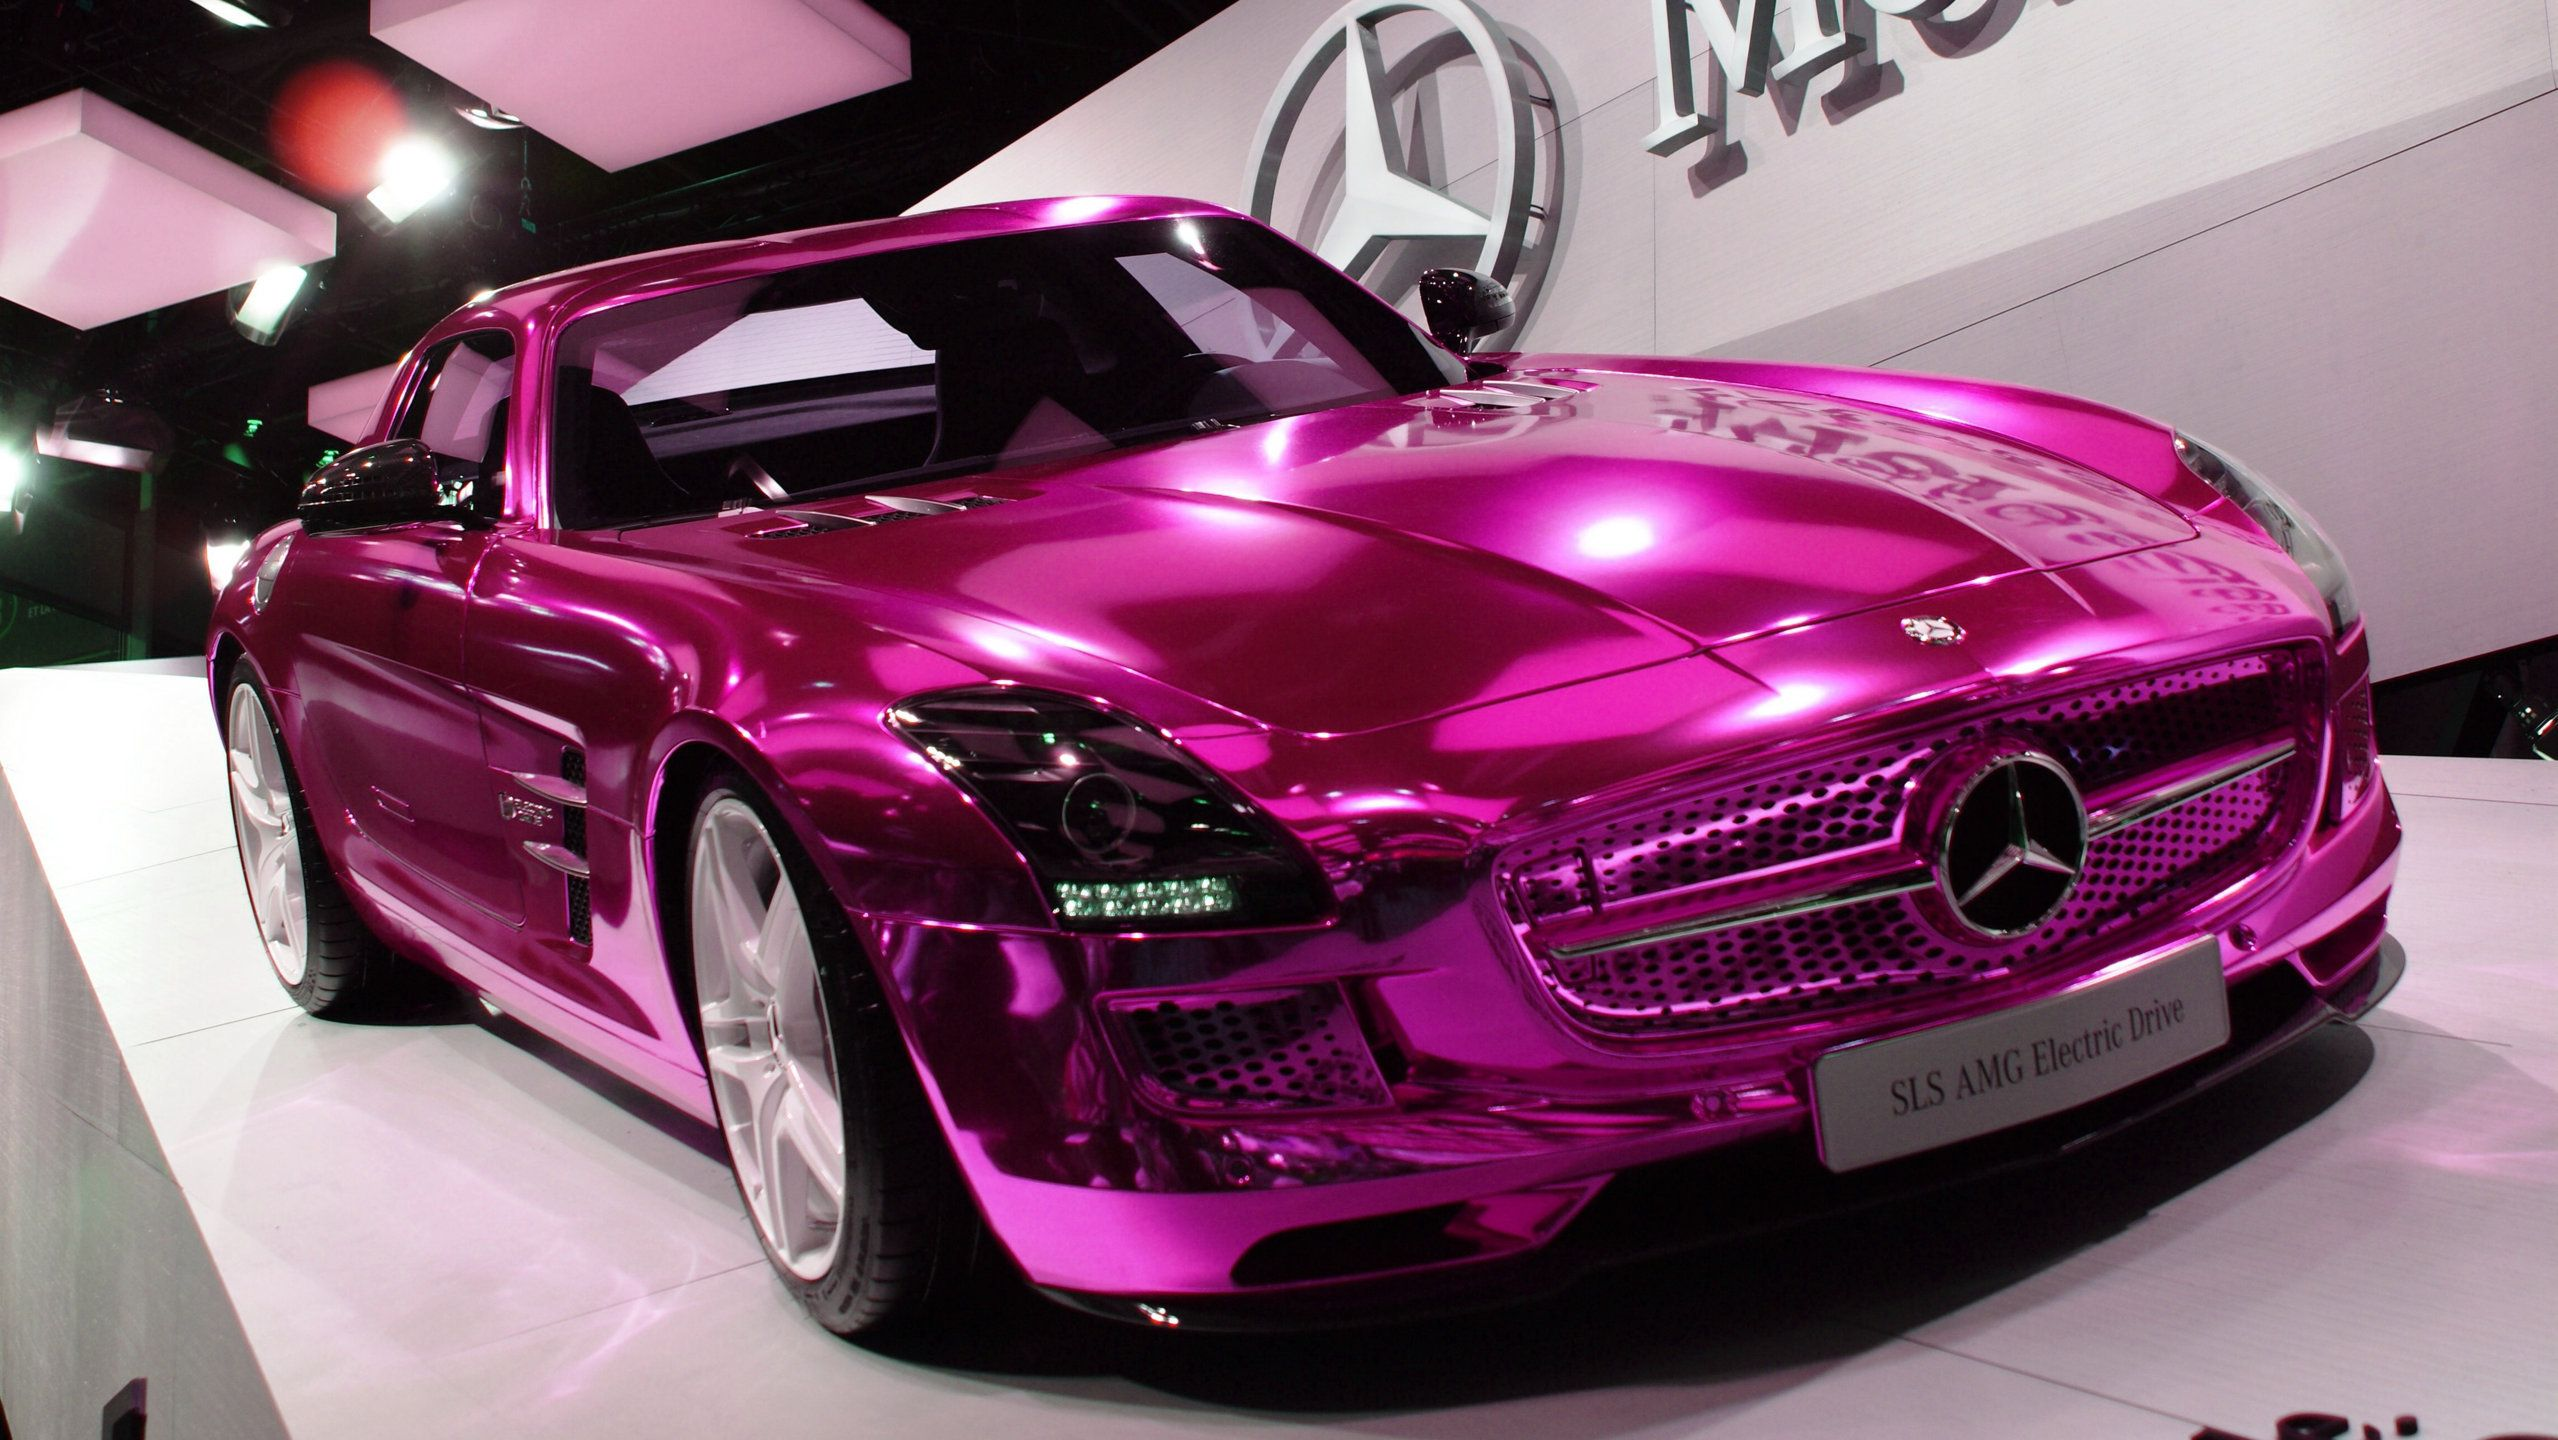 Car social network car flash pink chrome vinyl wrap